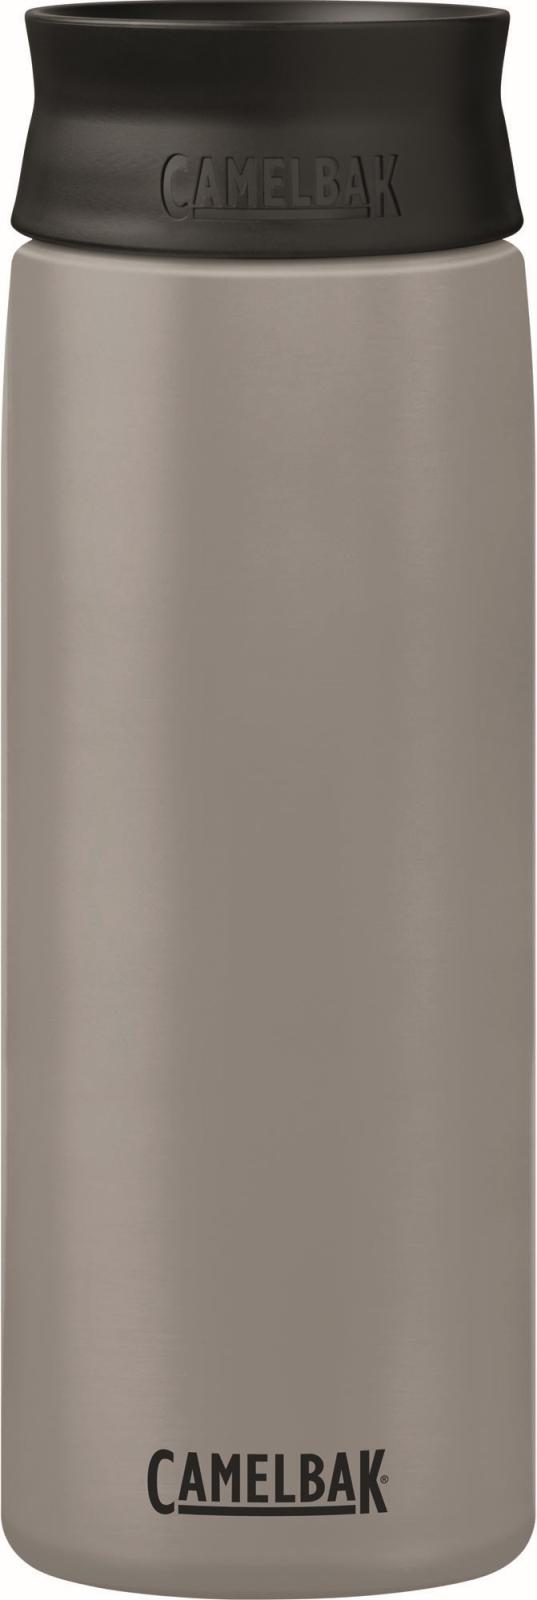 Camelbak Hot Cap Vacuum Stainless 0,6l - Grey uni